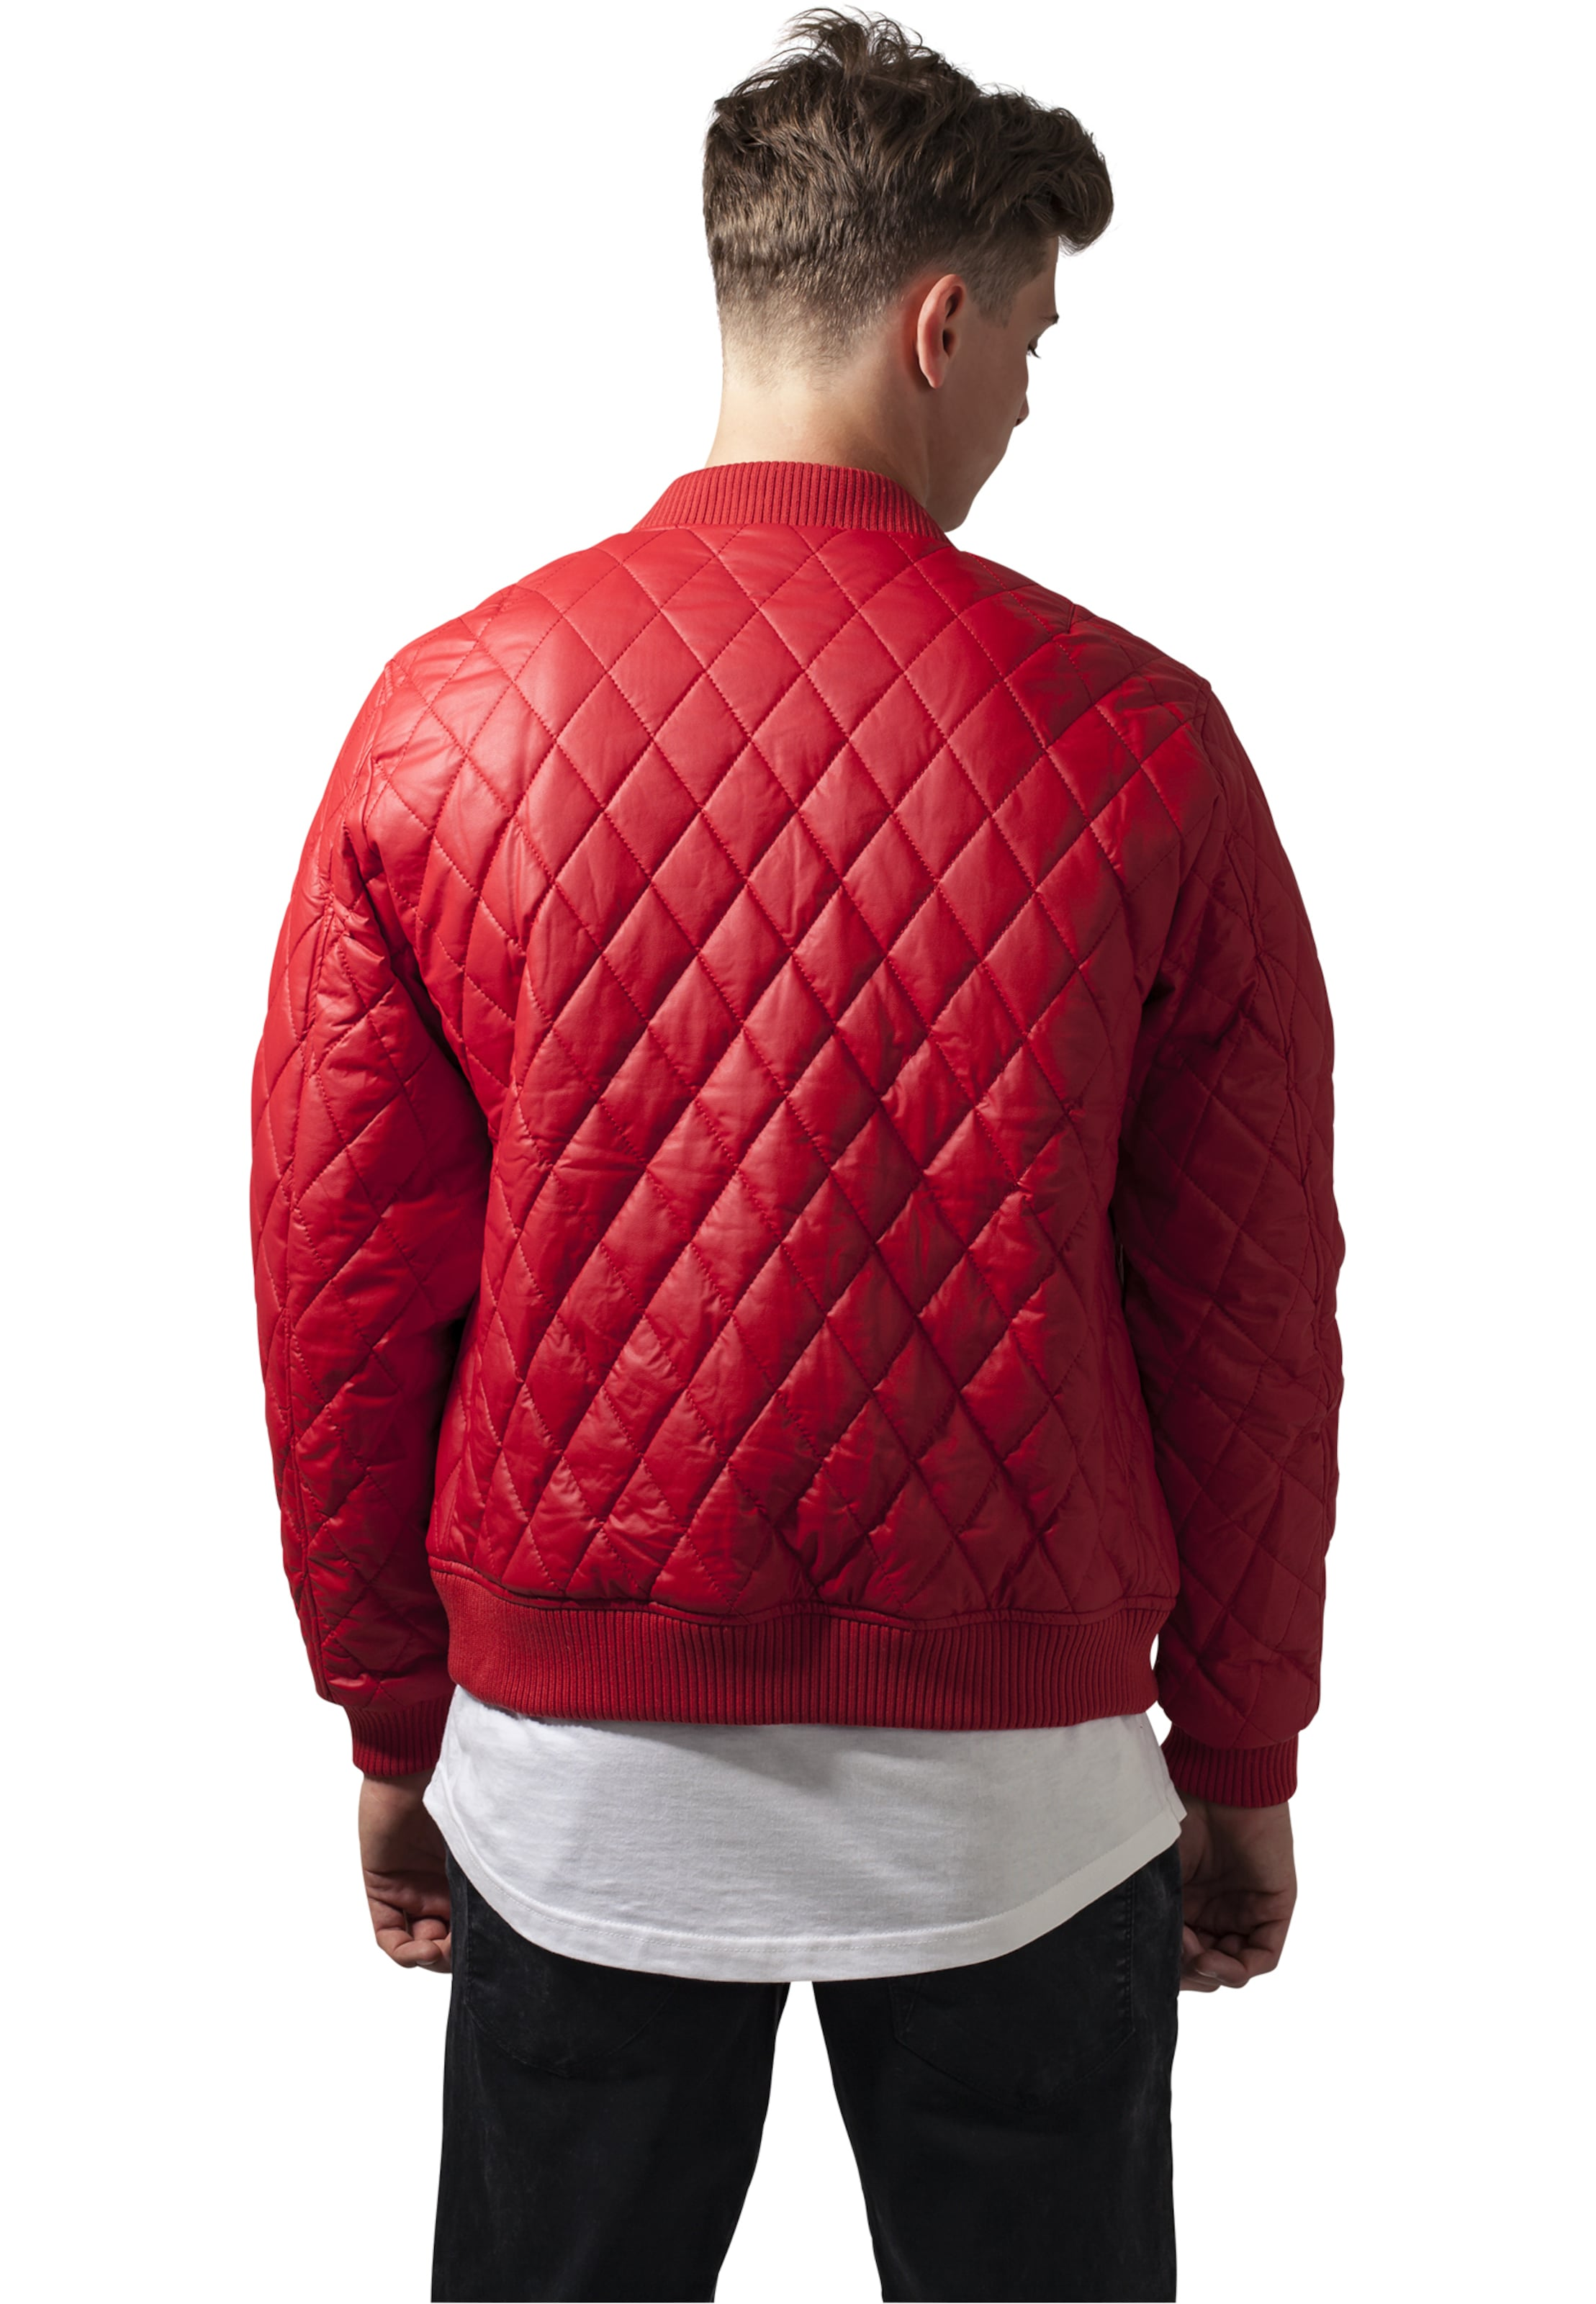 Urban Jacket In Urban Feuerrot Classics Jacket Classics In OP0nwk